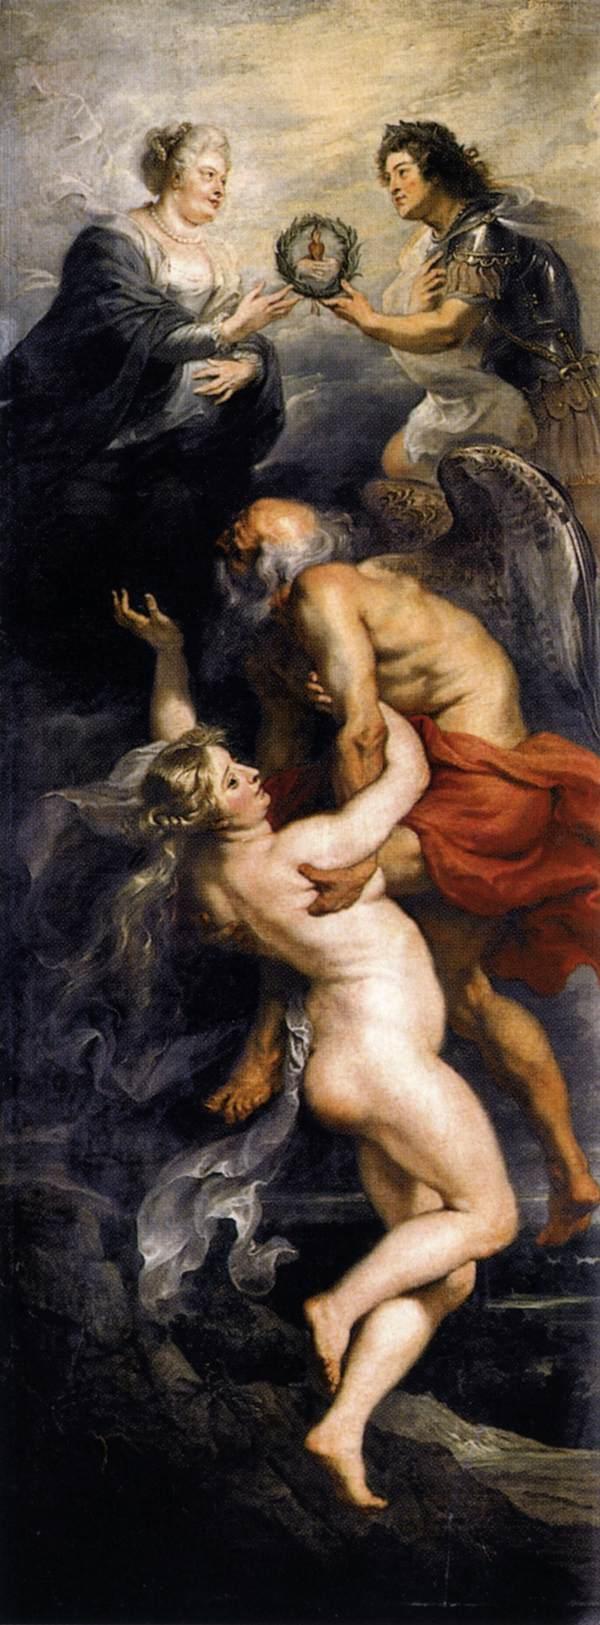 The Triumph of Truth - Peter Paul Rubens